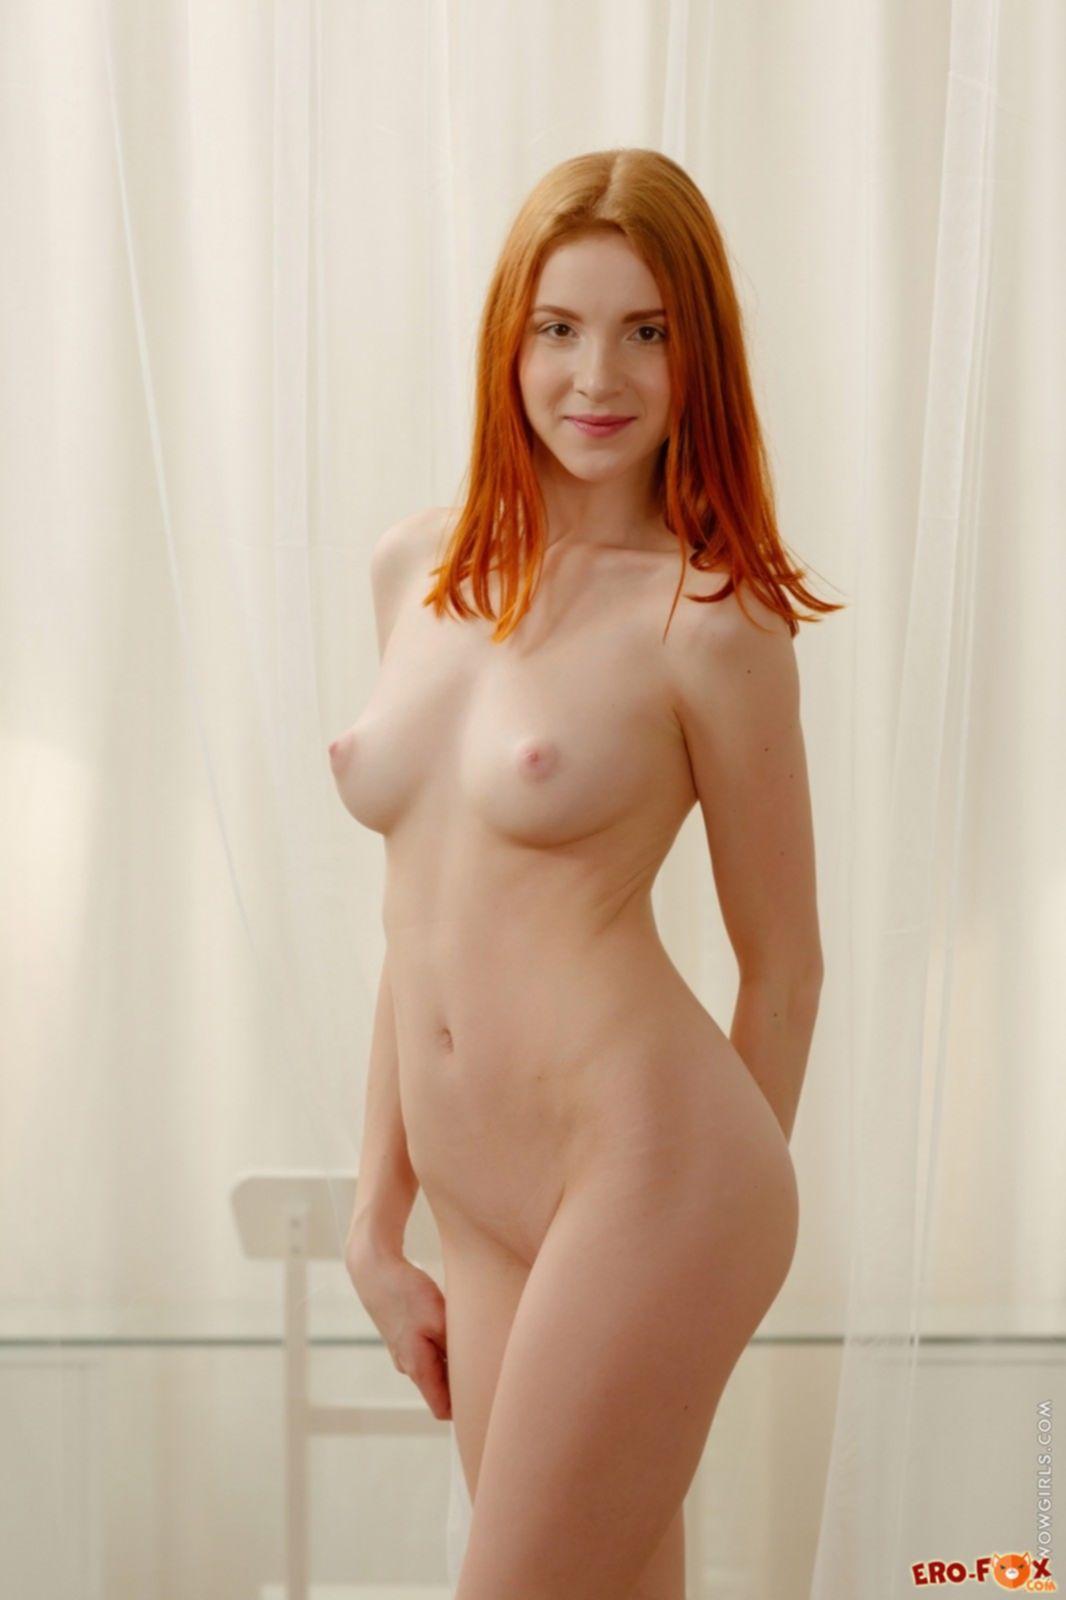 Грудастая рыжая девушка сняла пеньюар - фото